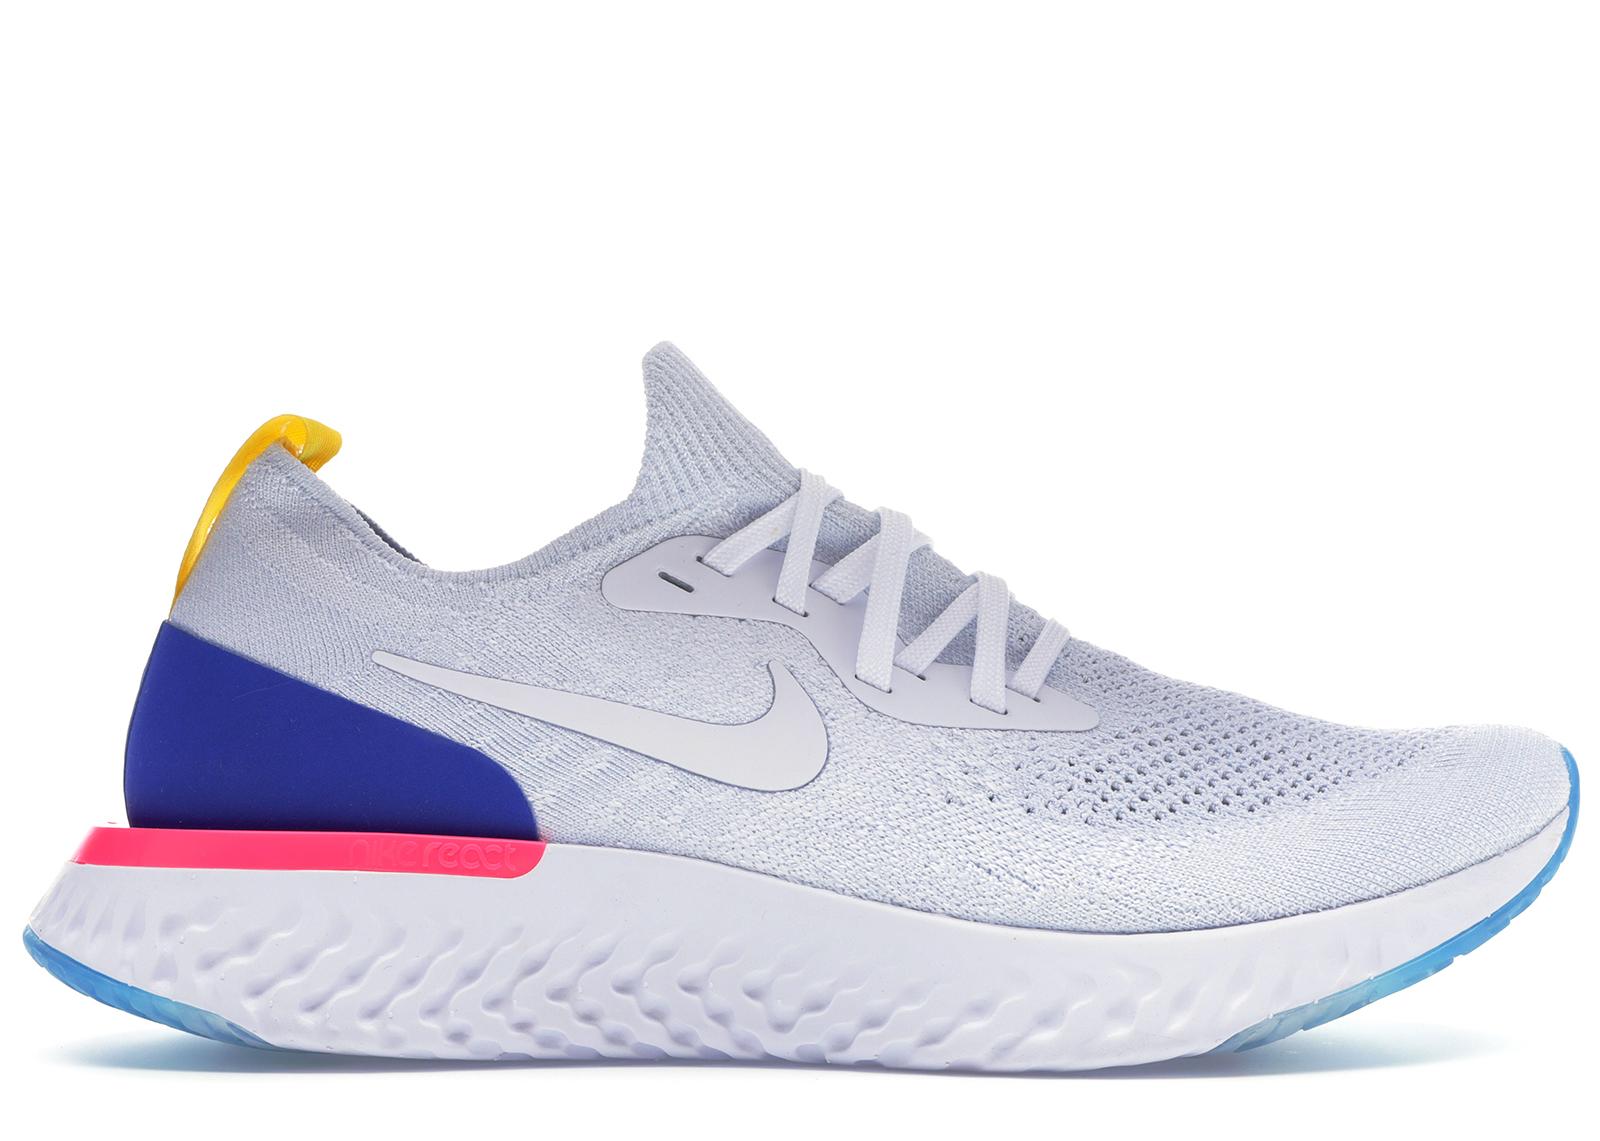 Nike Epic React Flyknit White Racer Blue Pink Blast - AQ0067-101